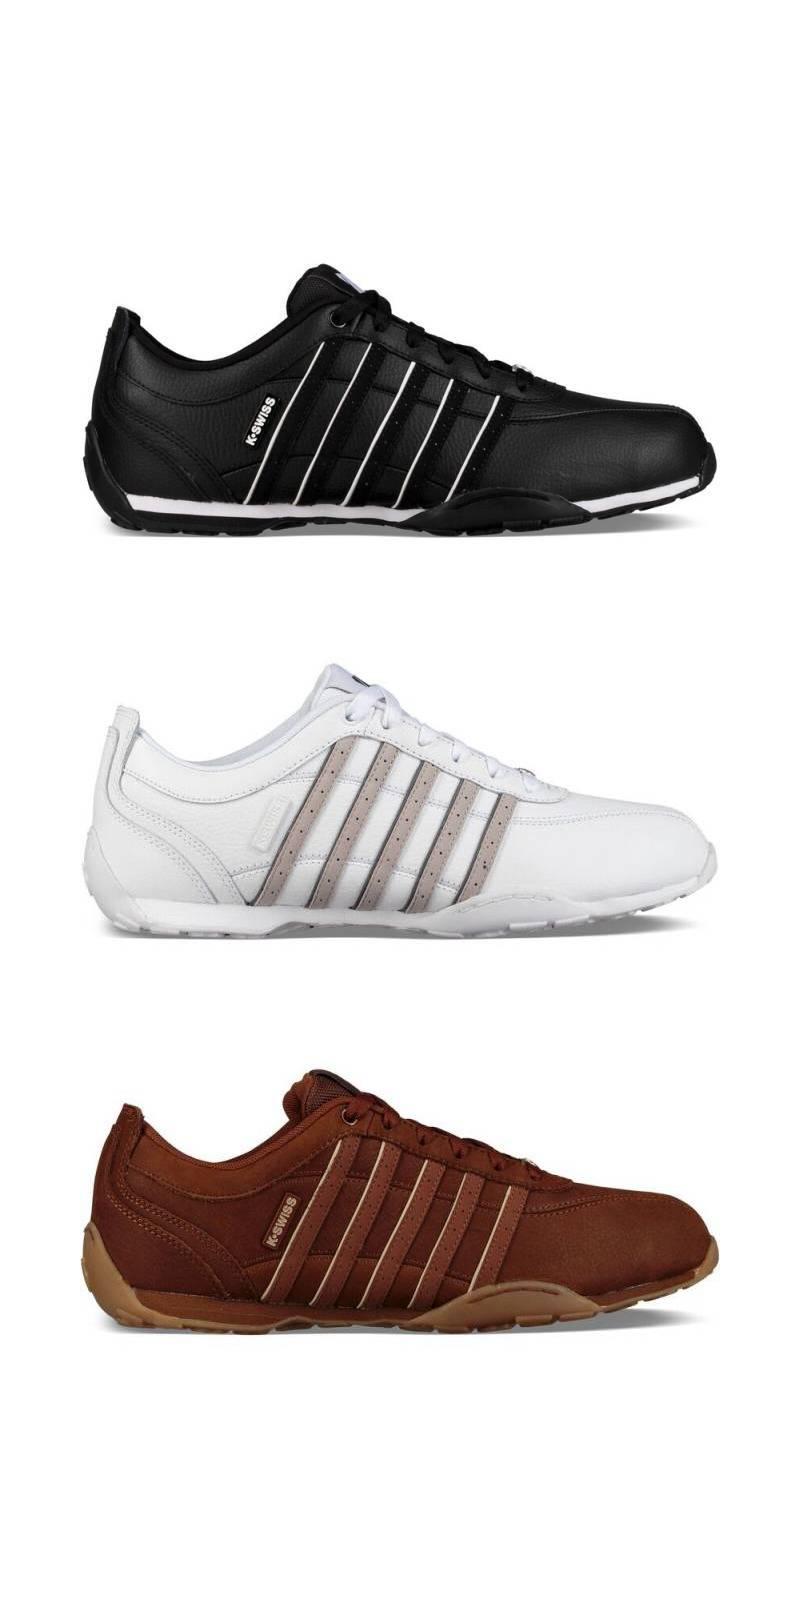 K-SWISS Arvee 1.5 Low-Cut Sneaker Freizeitschuhe Leder Textil Schuhe